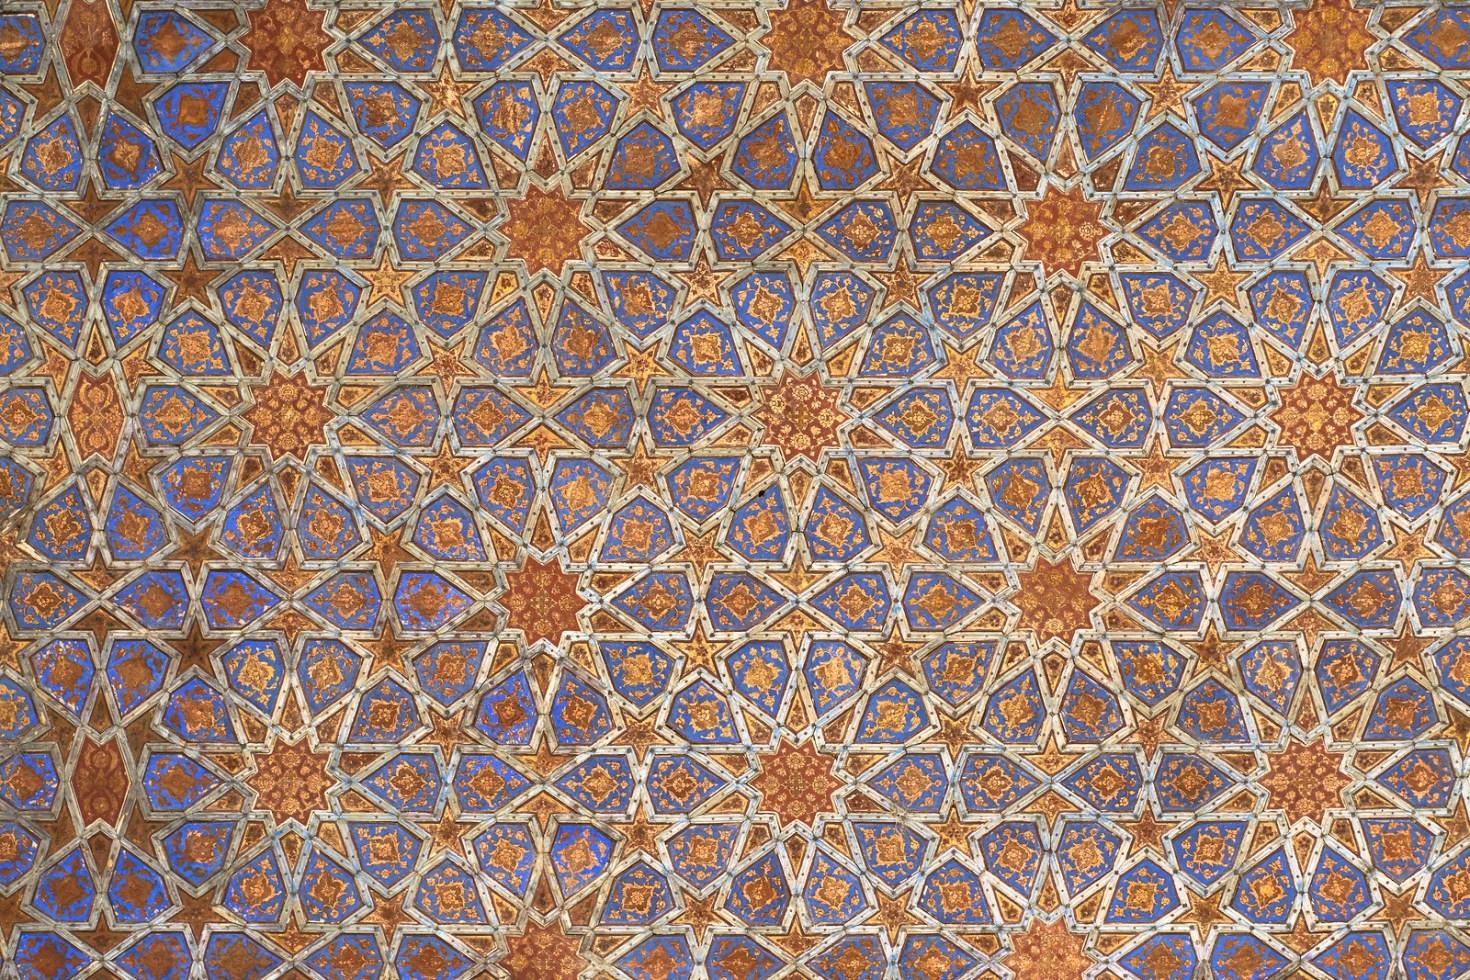 Ceiling Chehel Sotoun